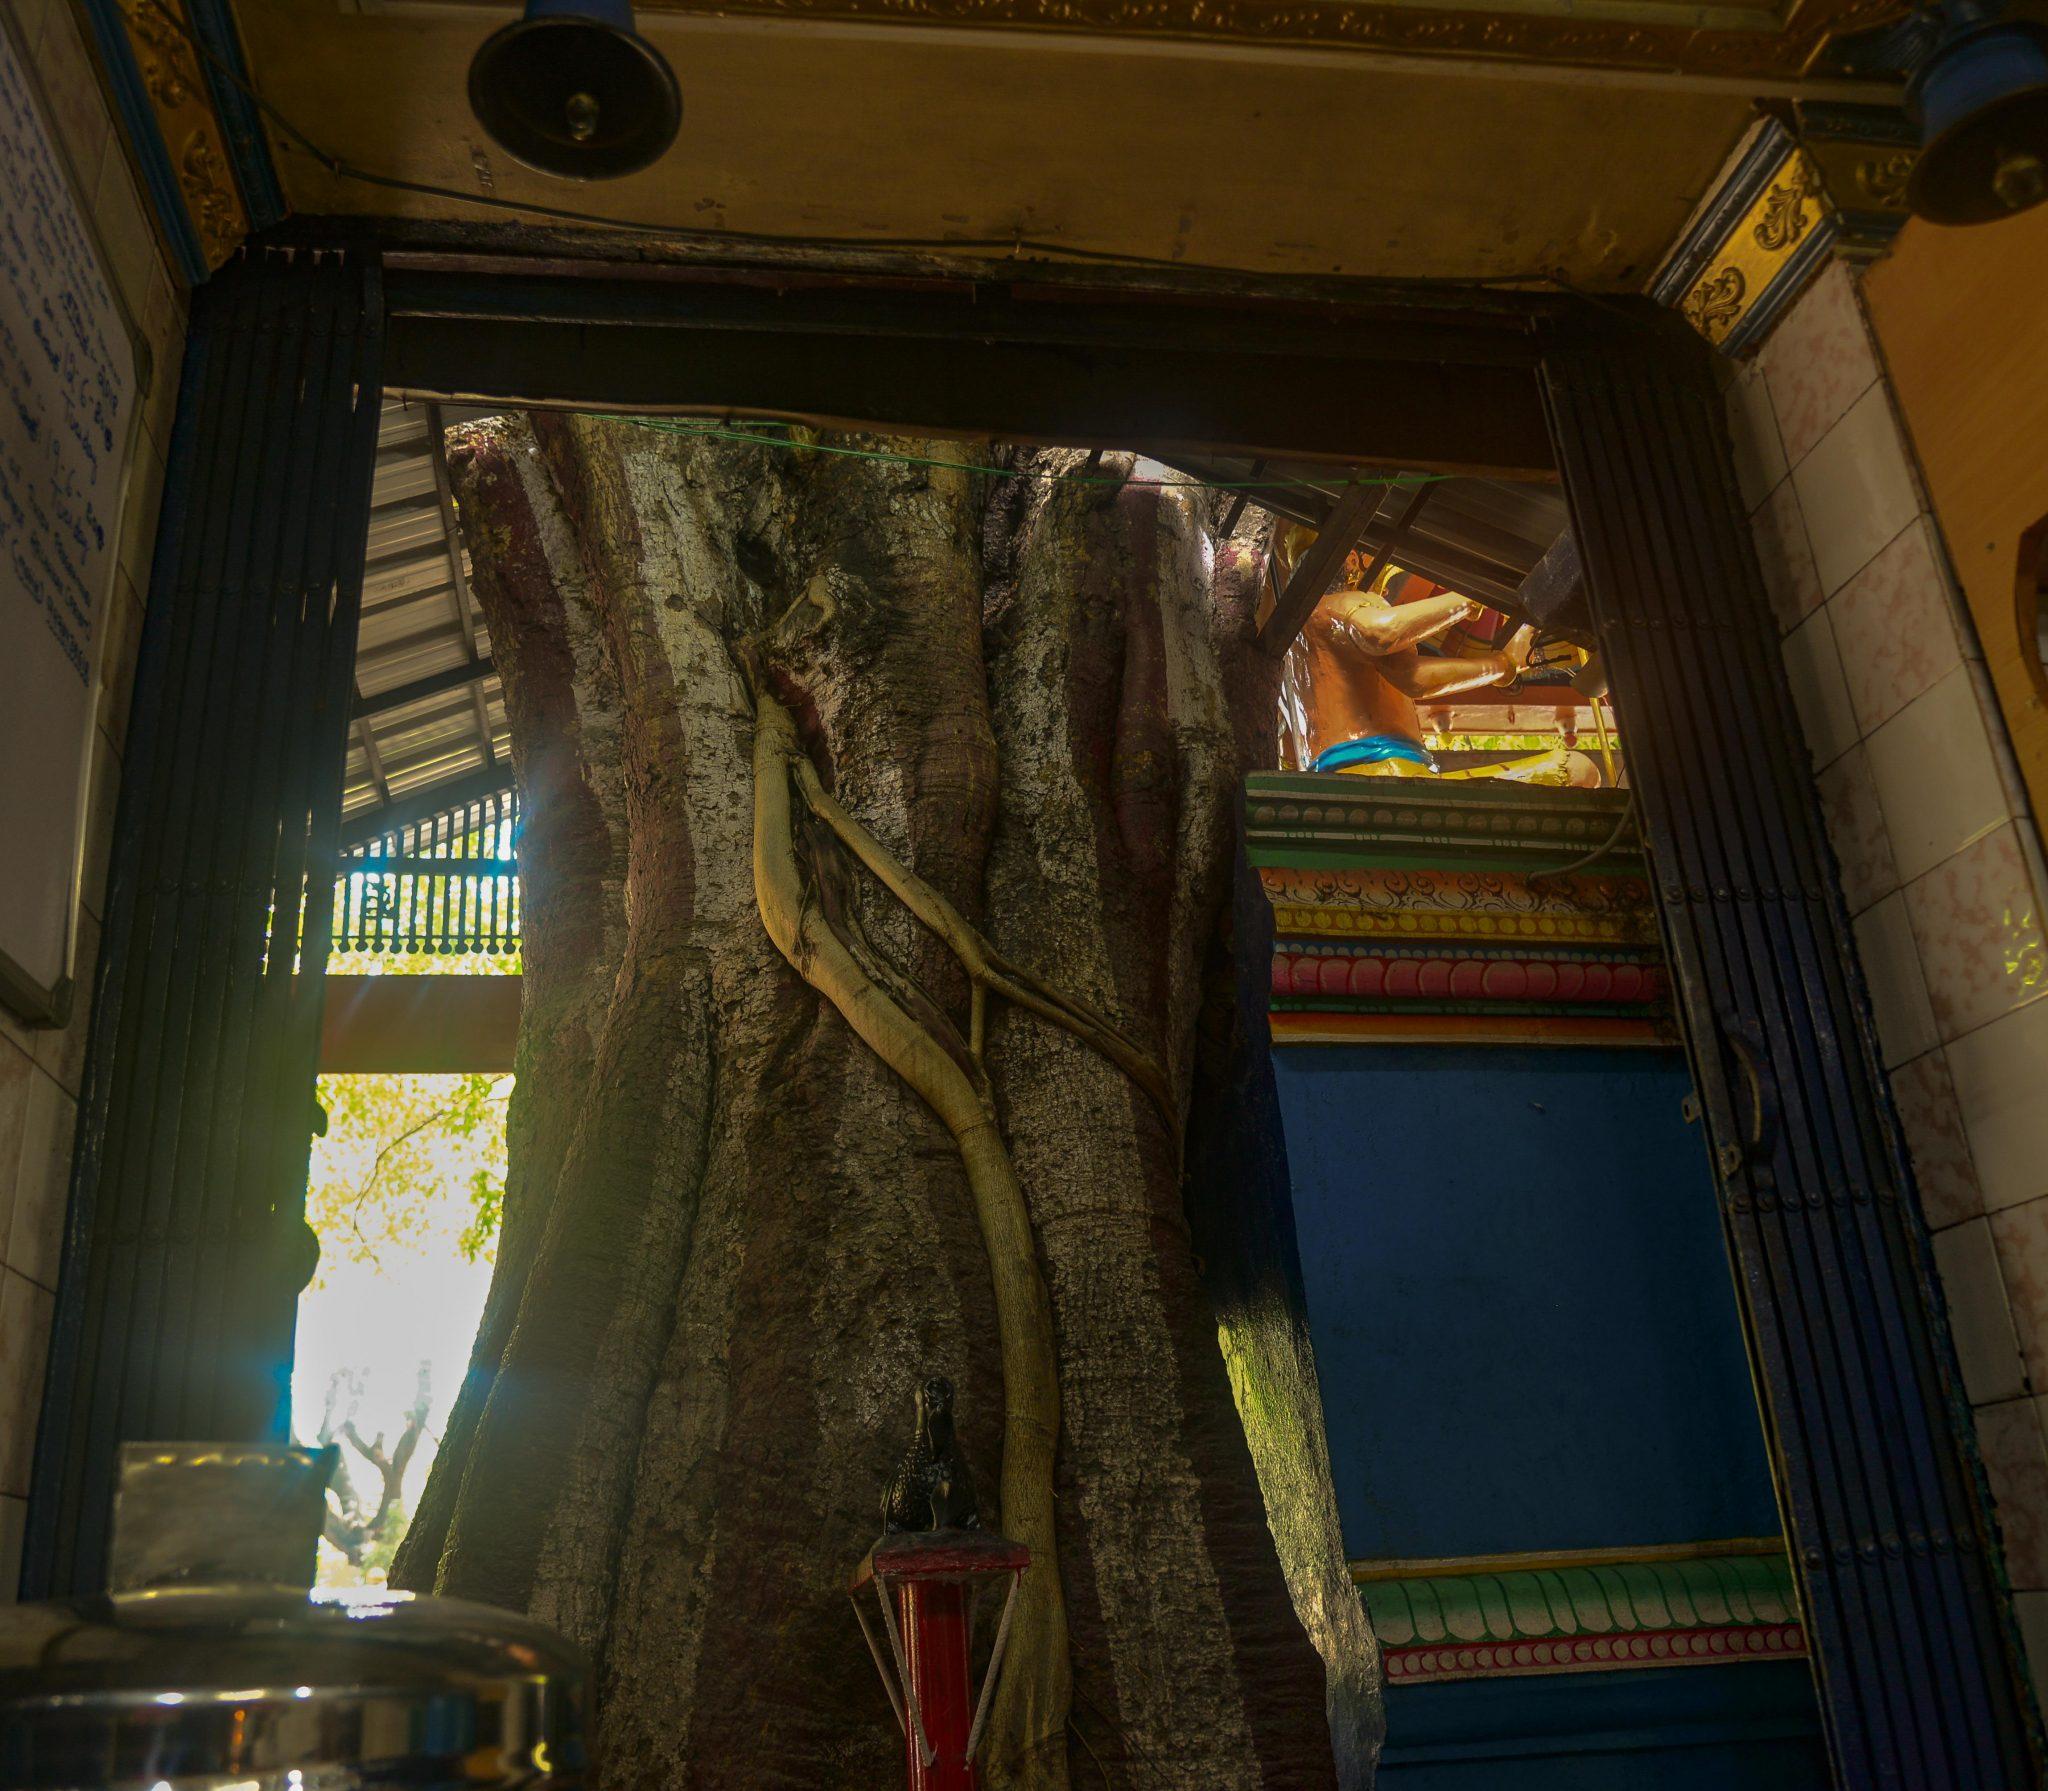 The Maha Muniswara temple, built around a Ficus tree. Photo credit: Suri Venkatachalam